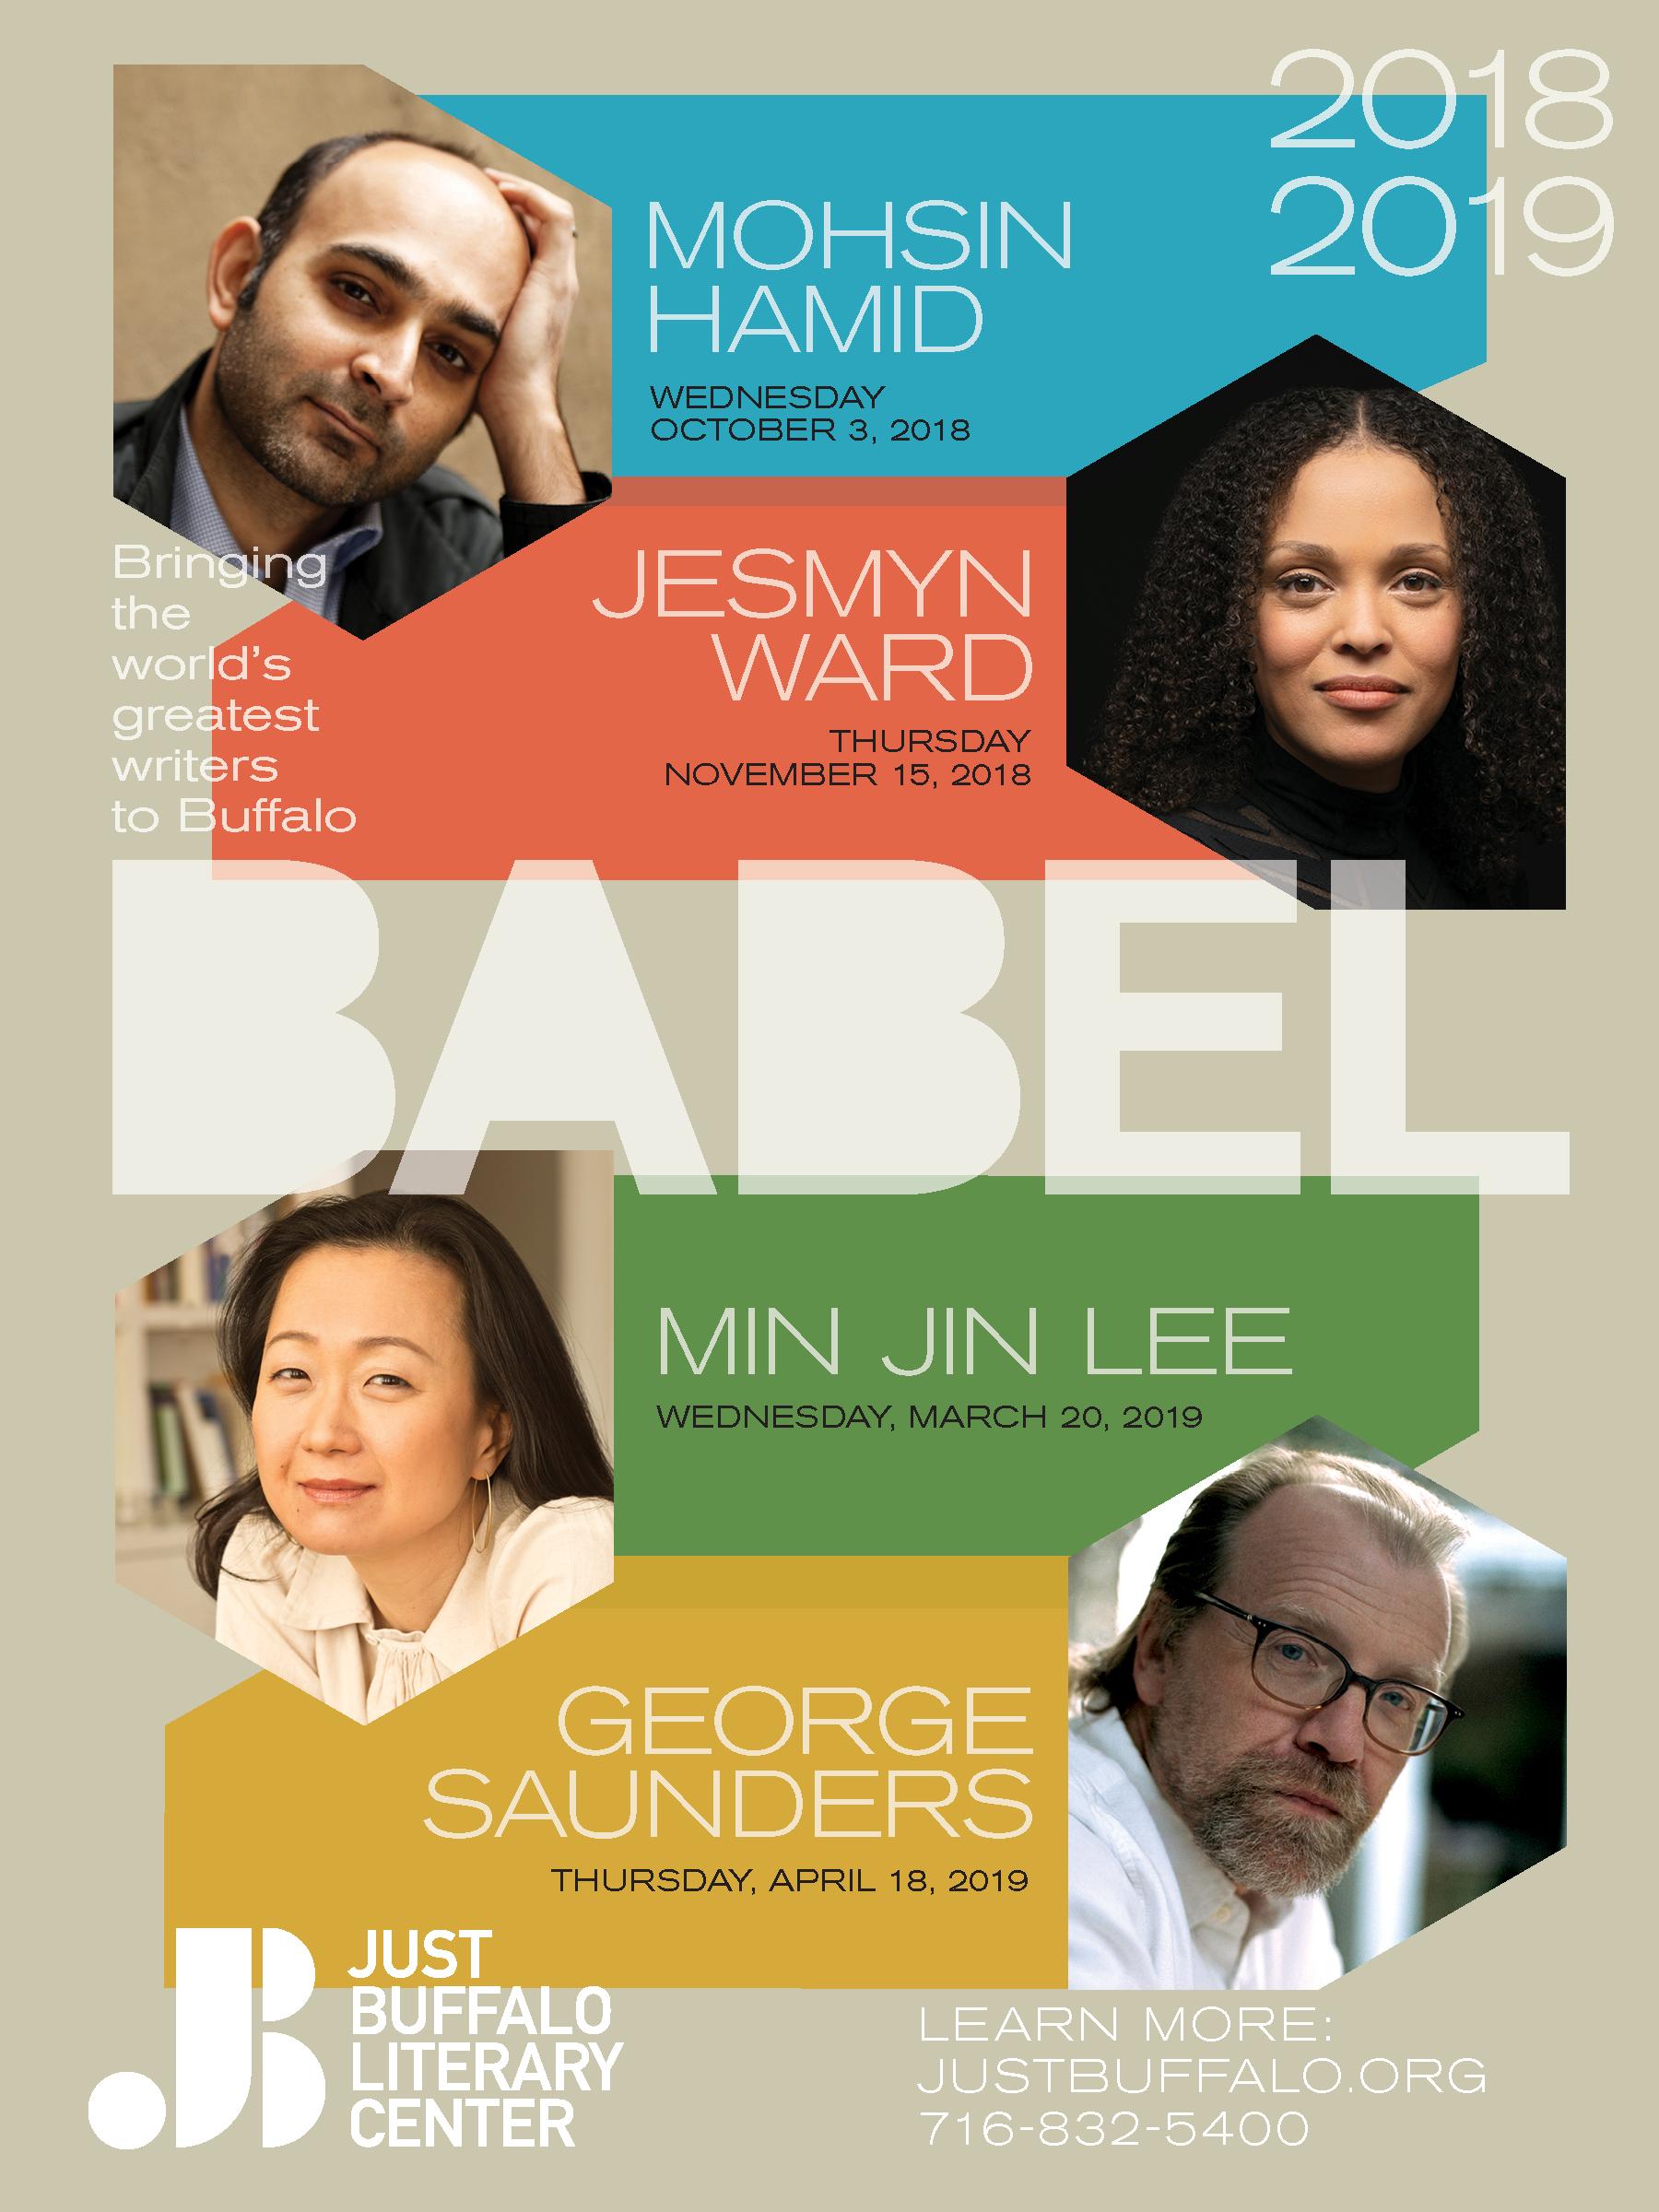 Babel-season-12-poster-2018.jpg